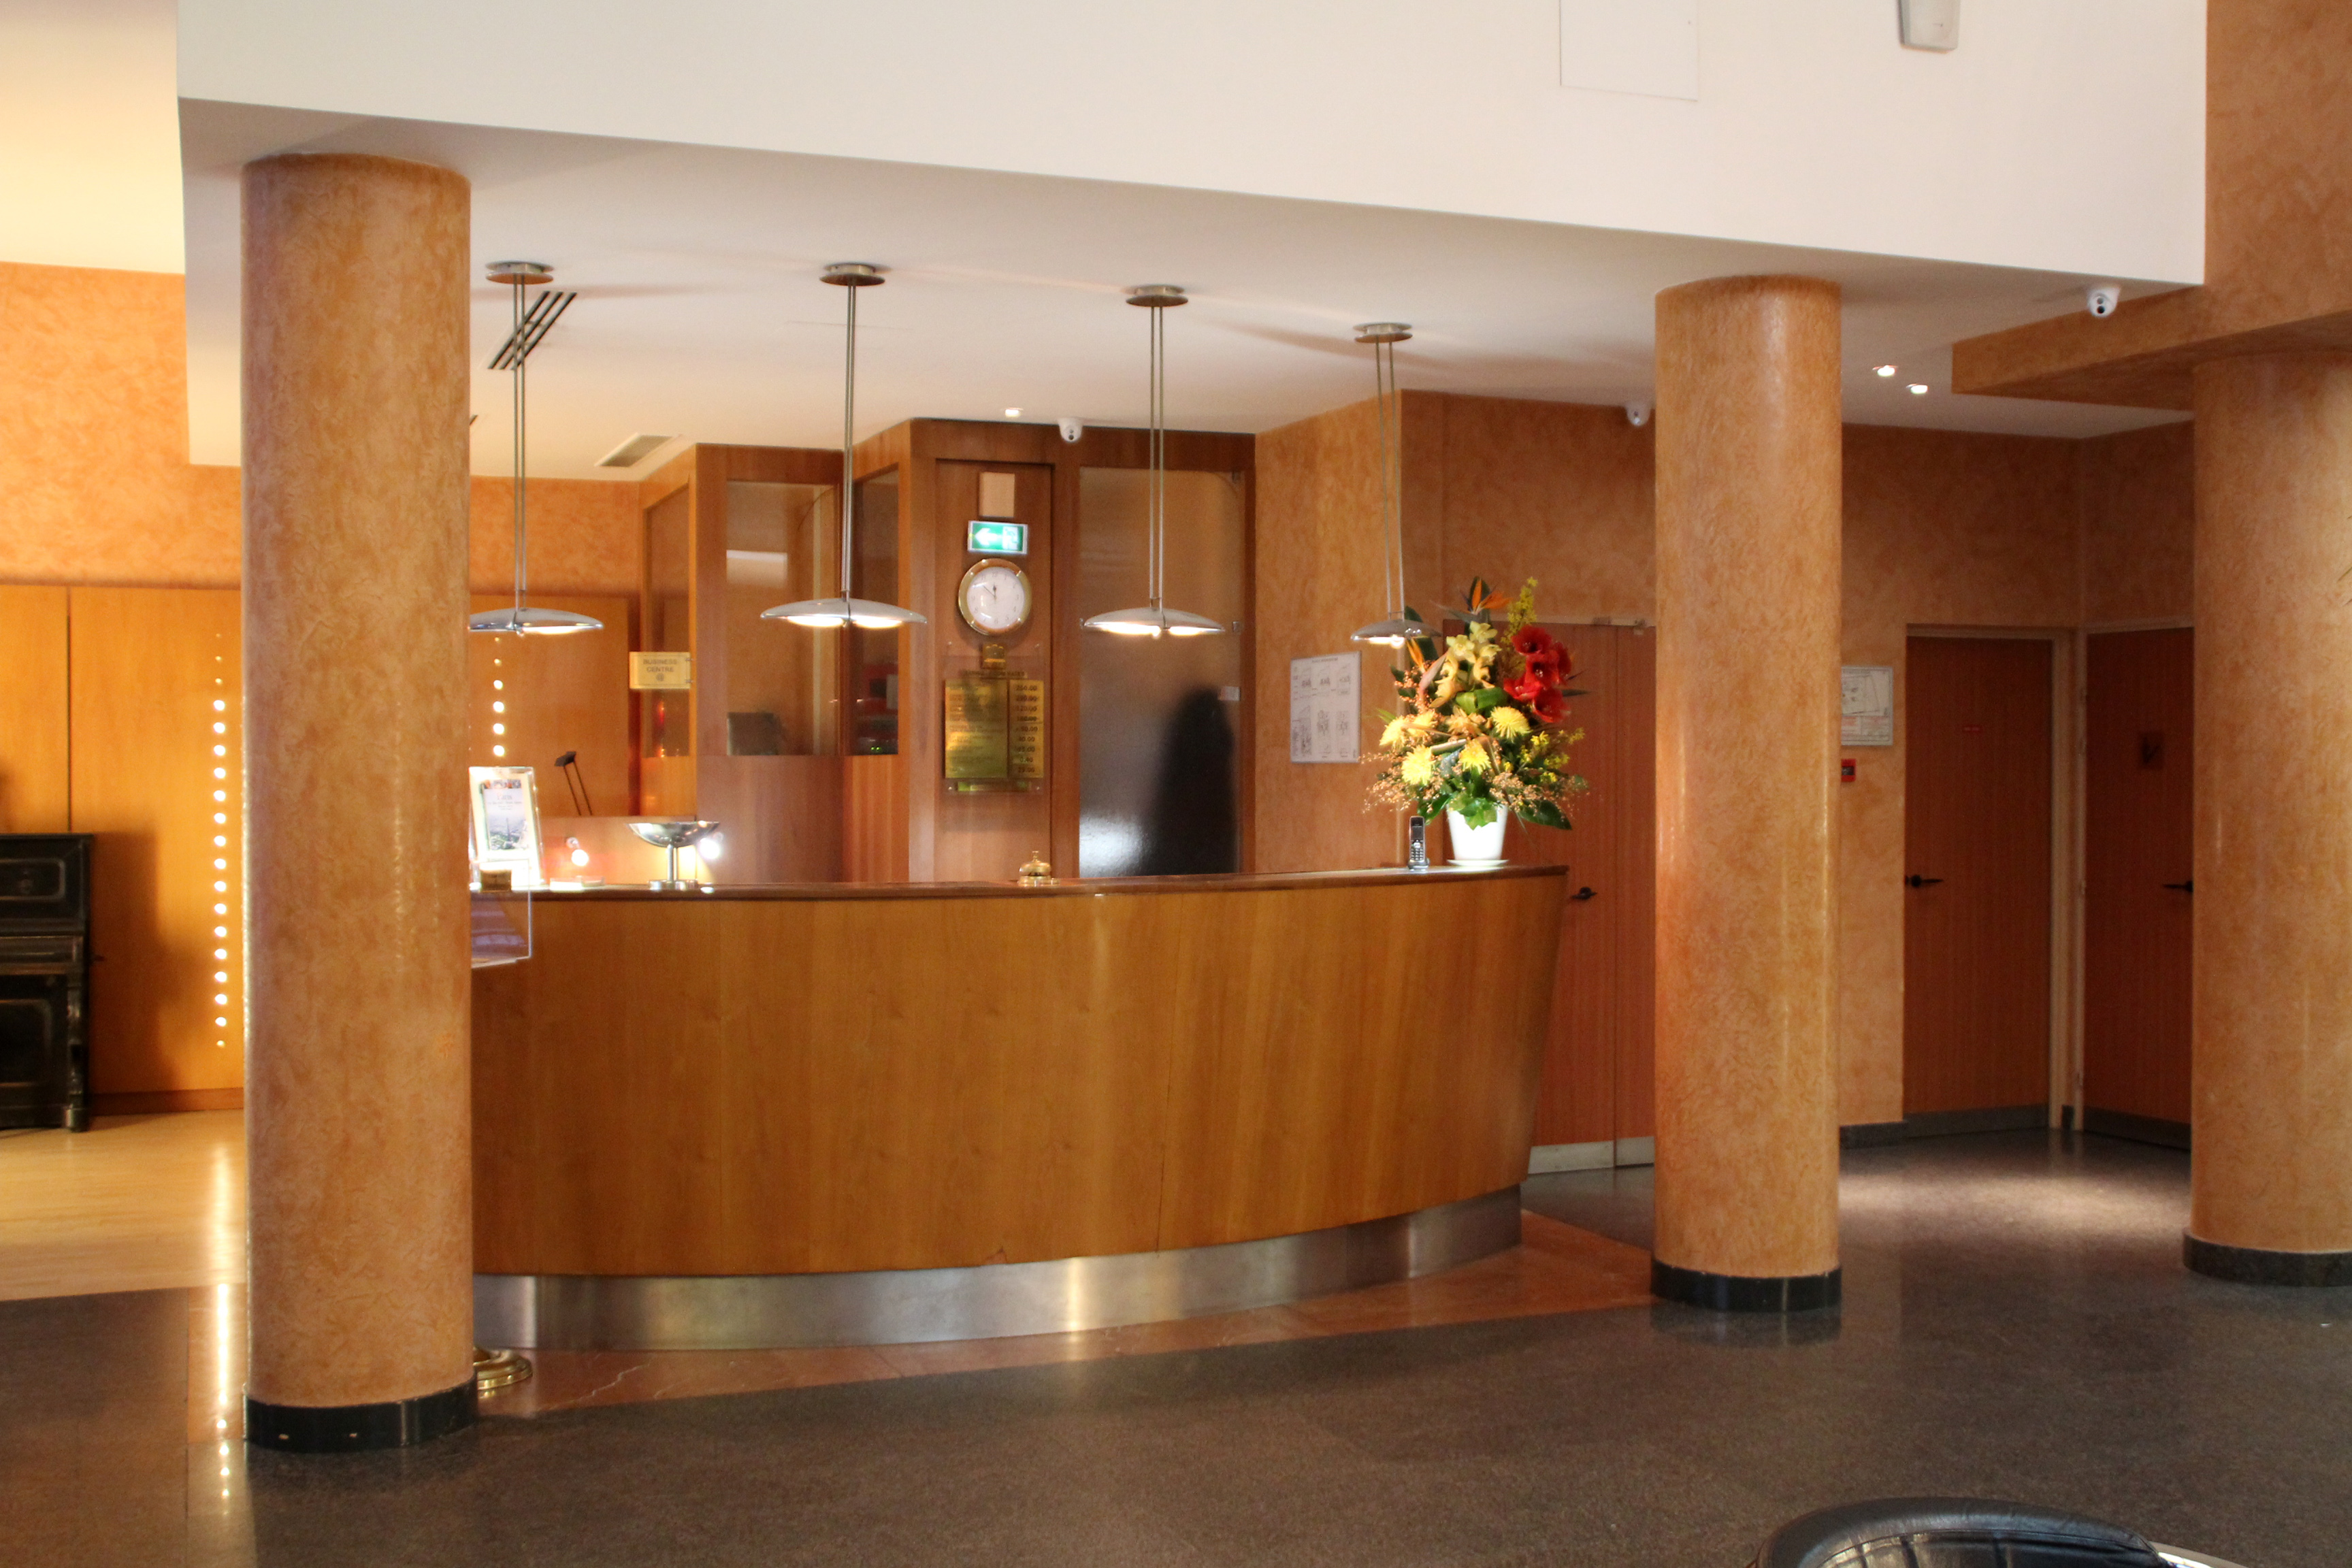 File:Reception, front desk 1 - Paris Opera Cadet Hotel.jpg ...